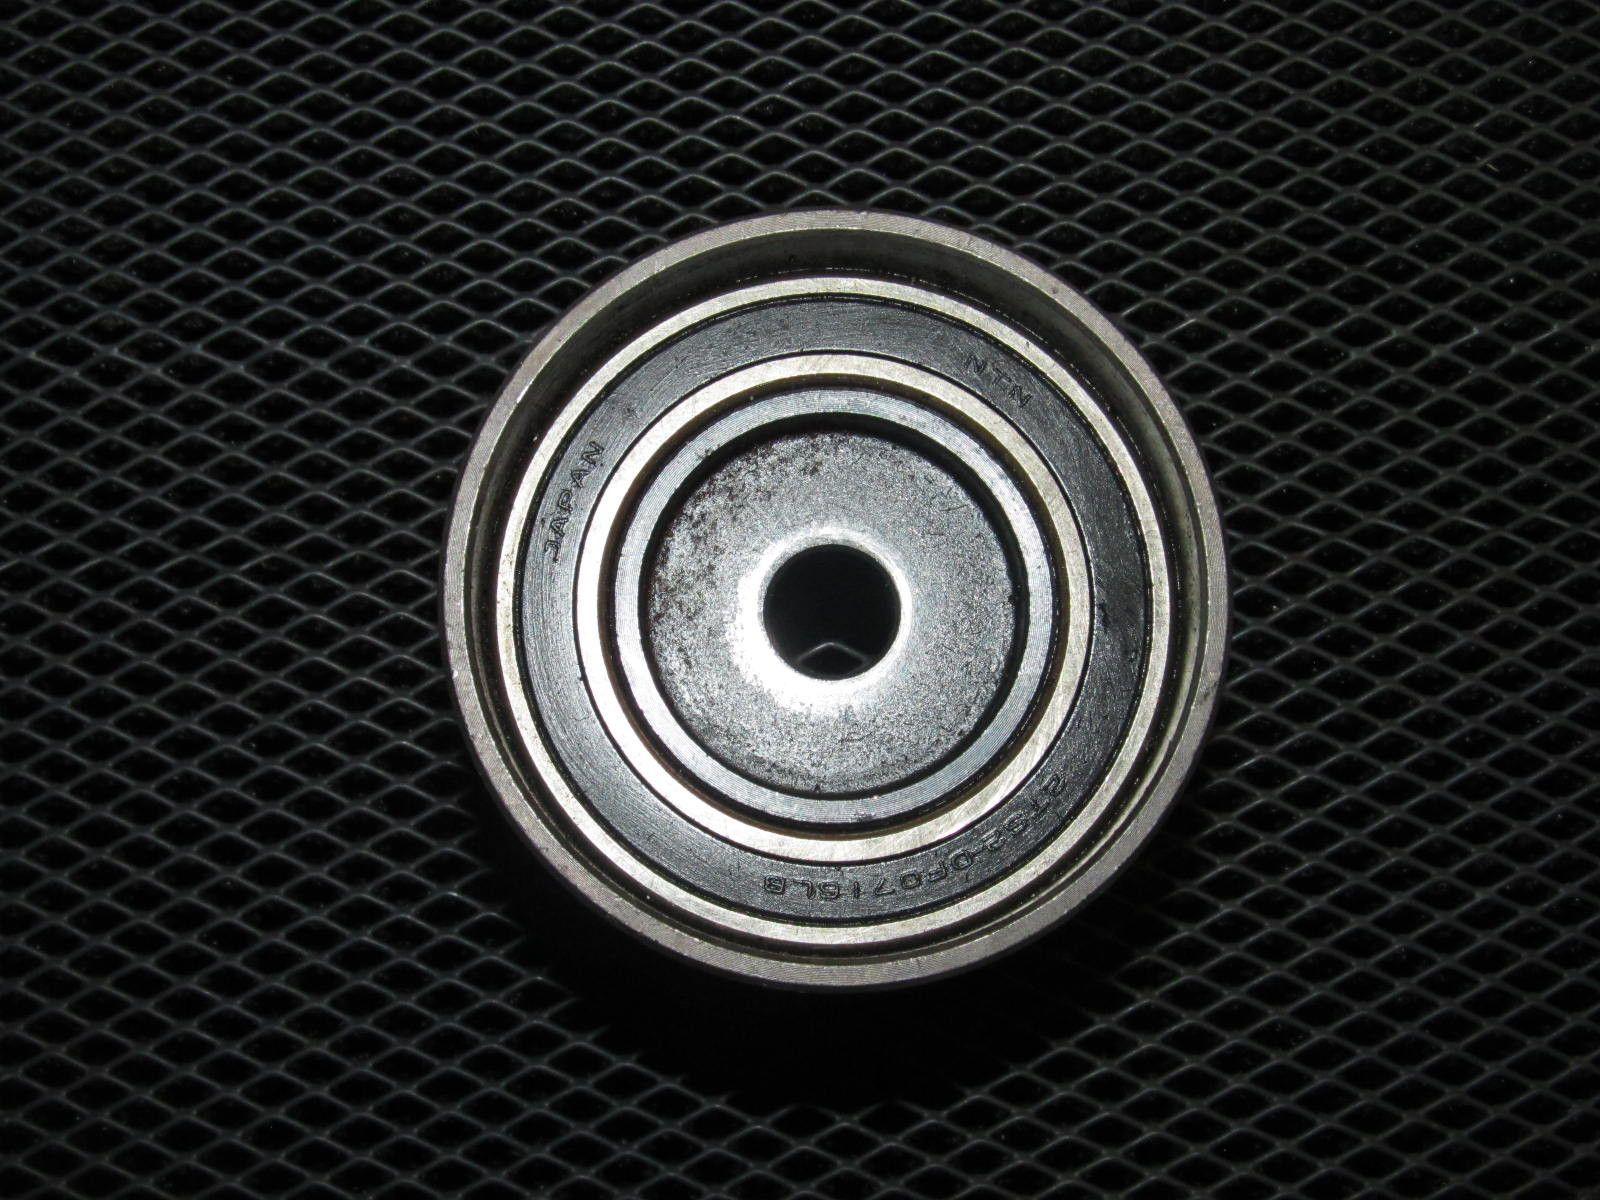 90 96 Nissan 300zx Timing Belt Tensioner Pulley Autopartonecom